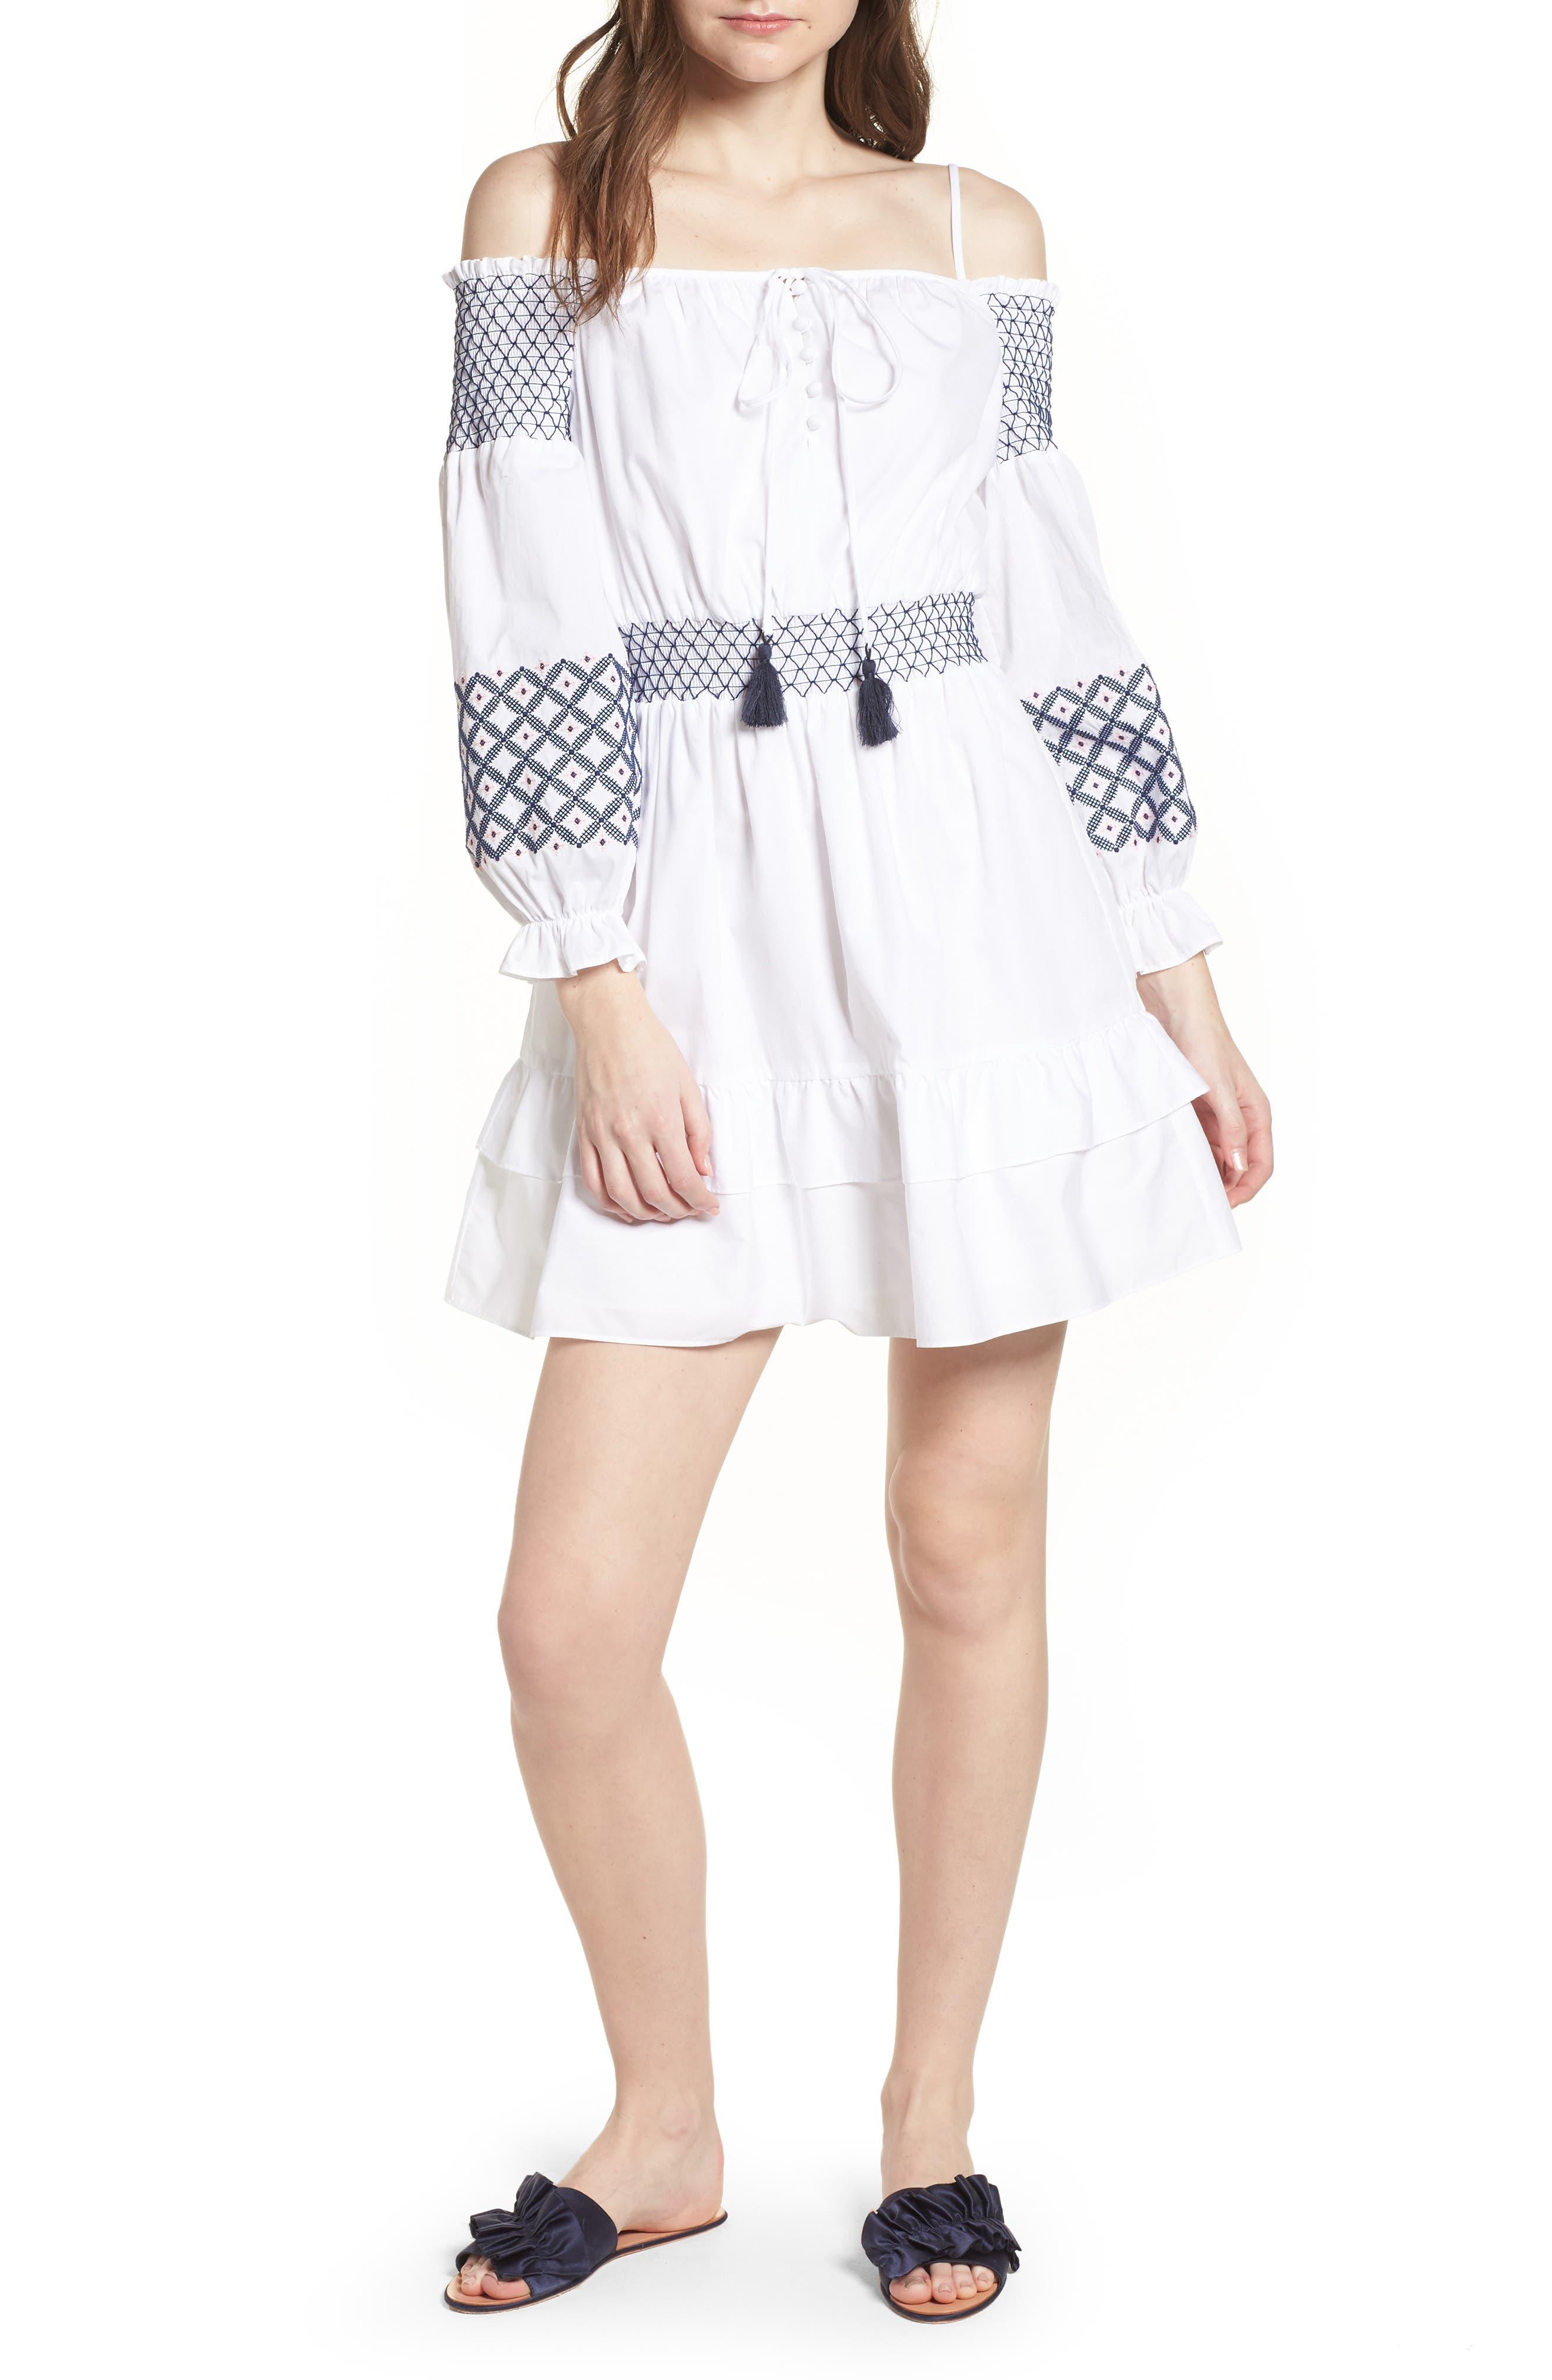 Rebecca Minkoff Brittany Embroidered Cold Shoulder Dress